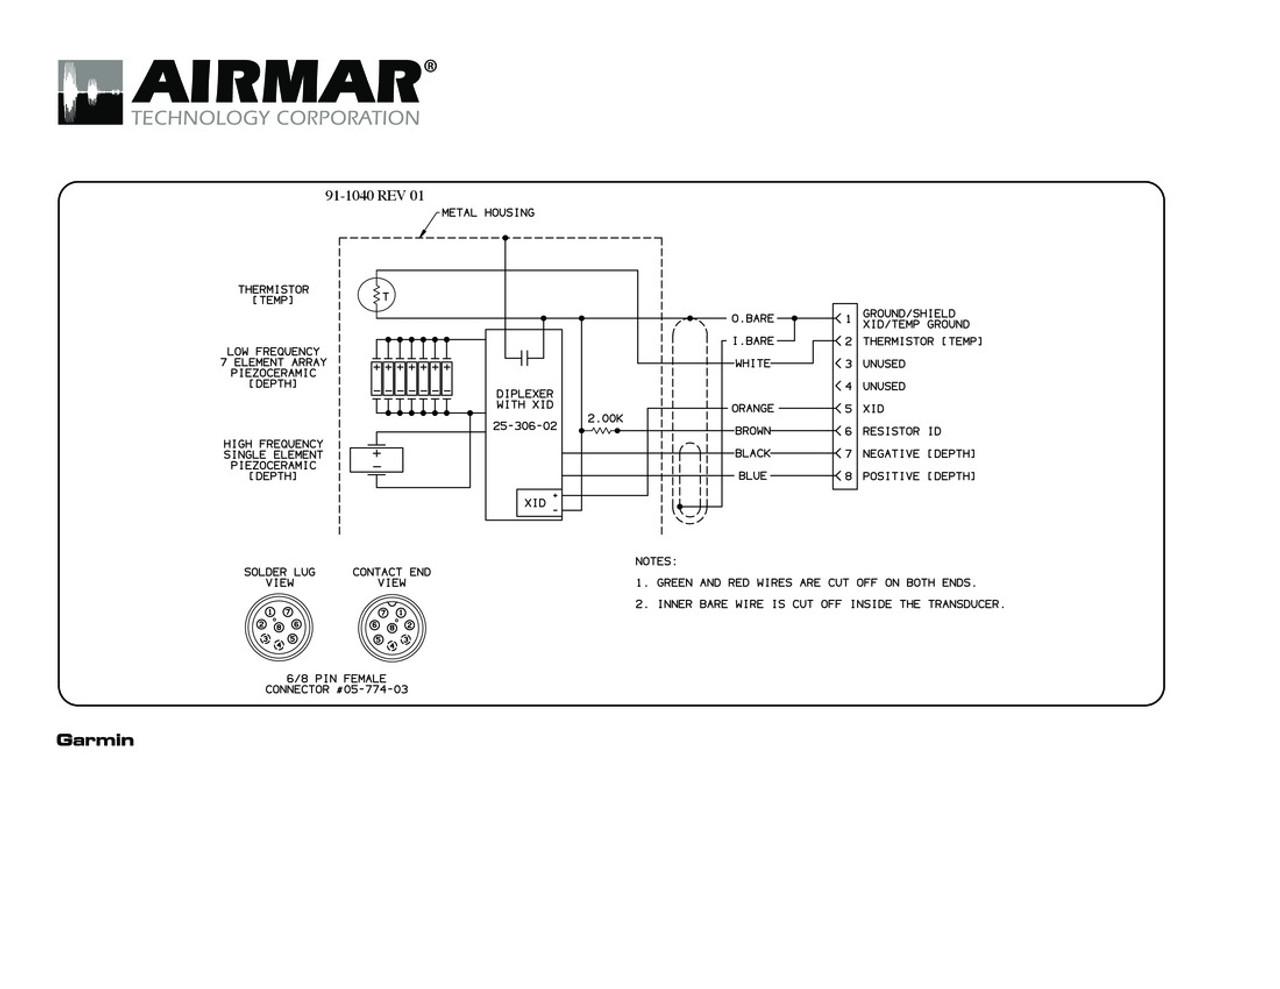 Lowrance Nmea 0183 Wiring Diagram Free Download Electrical Hook 7 Pin On Pinterest Wire Data Schema U2022 Elite